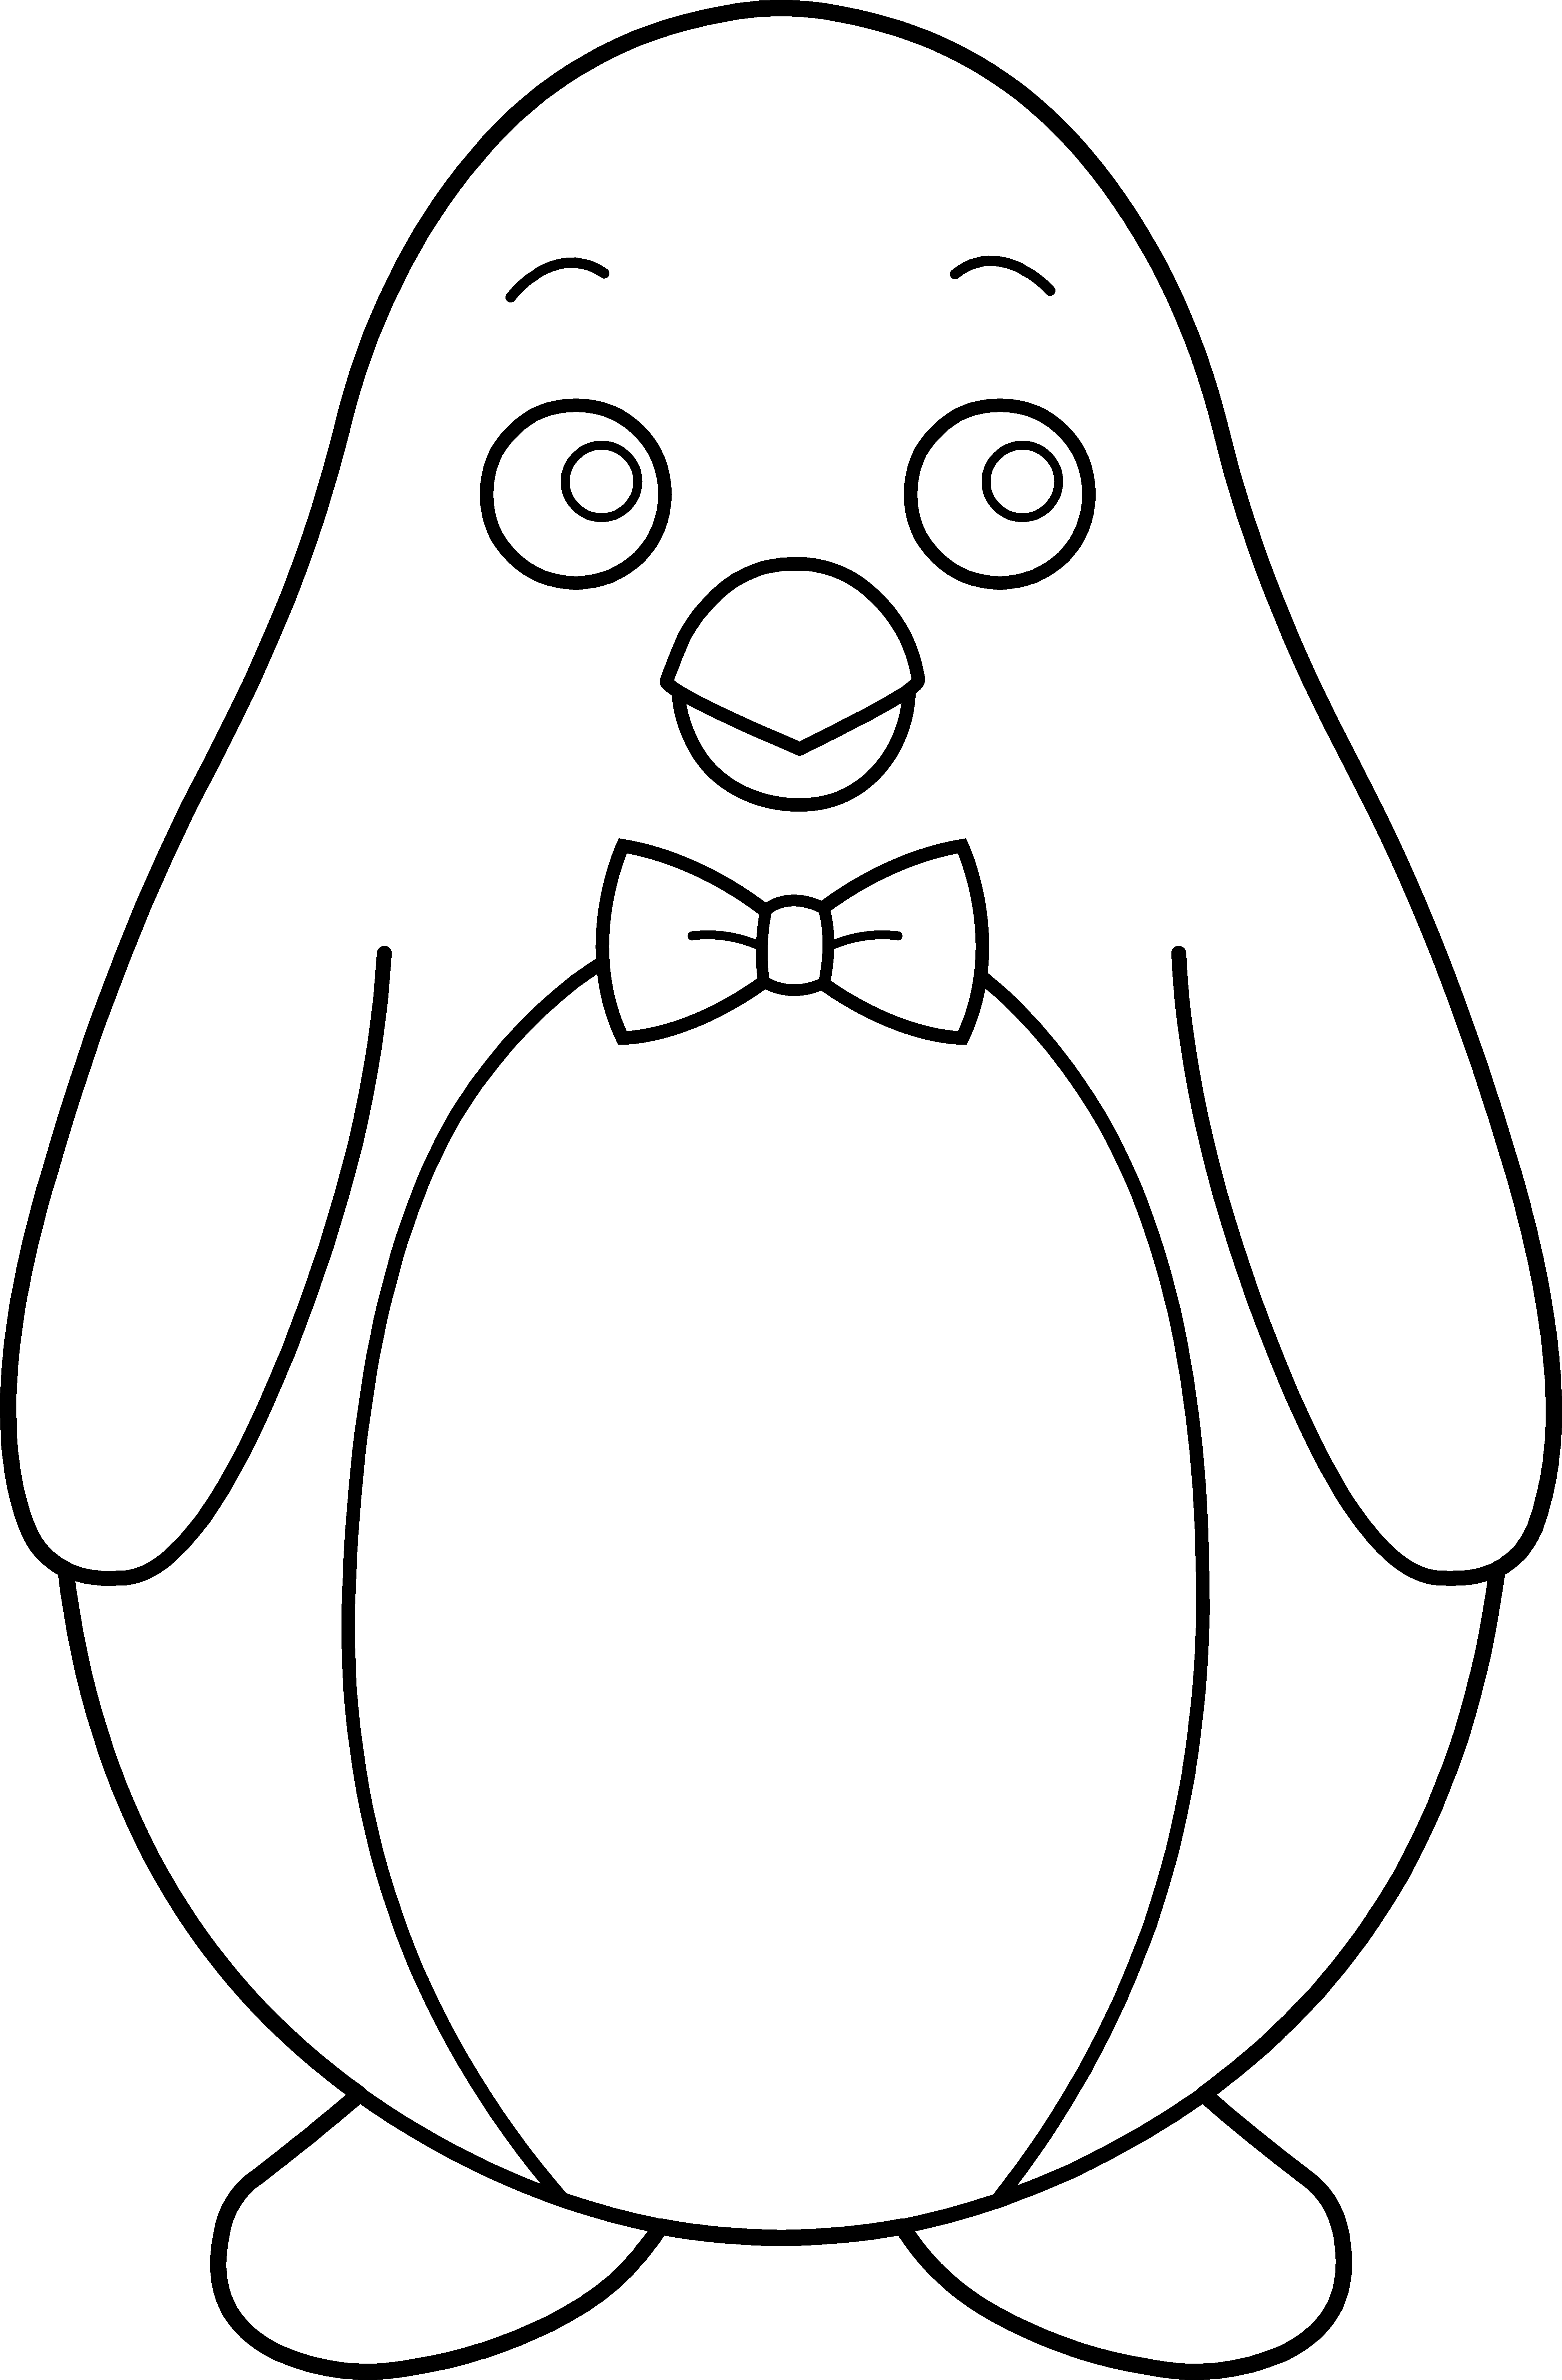 Clipart penquin girly. Necktie panda free images